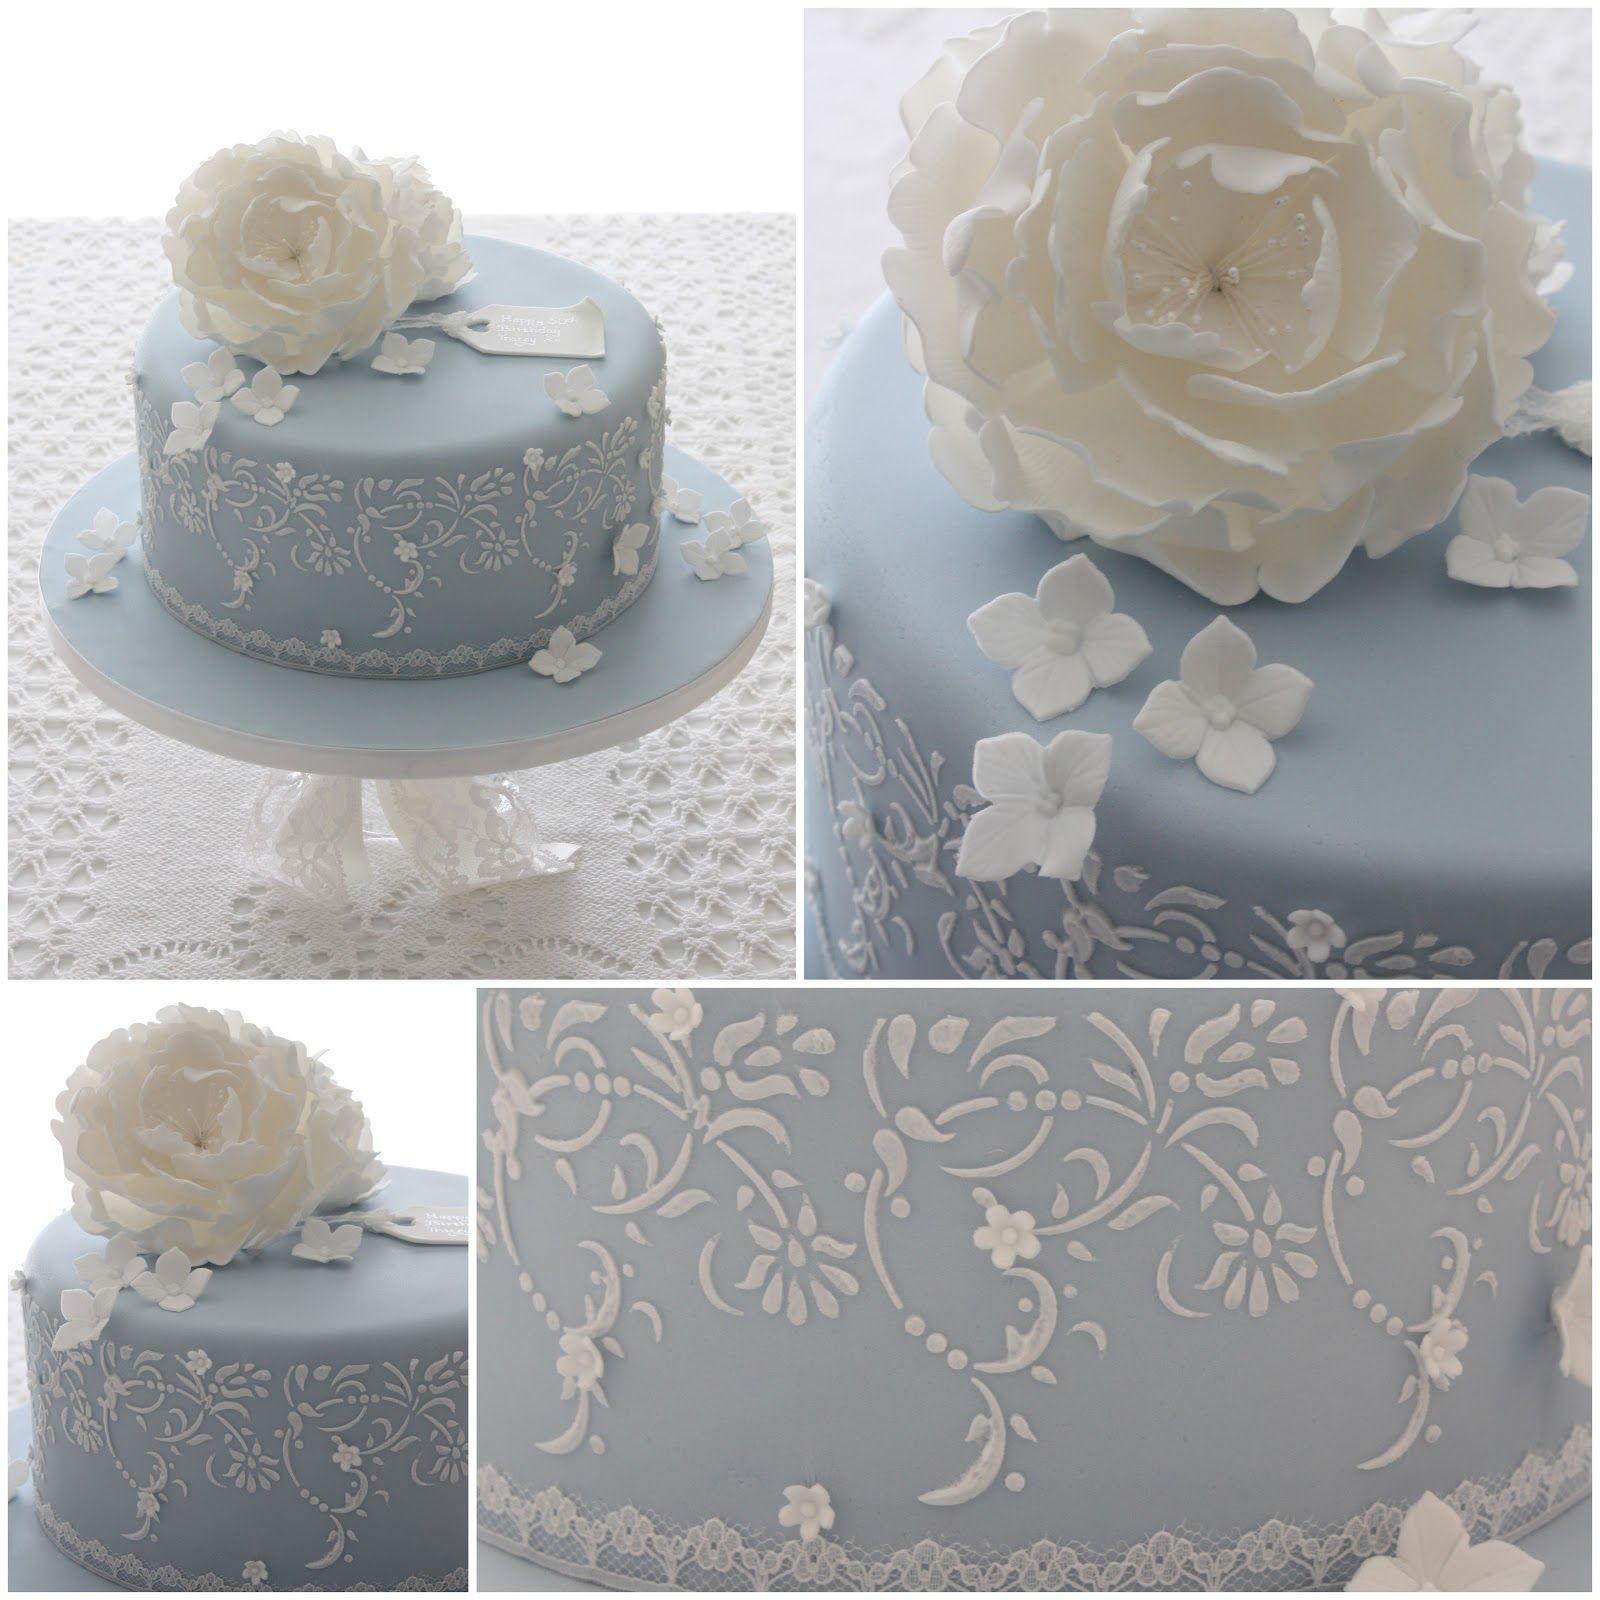 Pin by Jacqui Shepherd on Cake Decorating Ideas Pinterest Cake